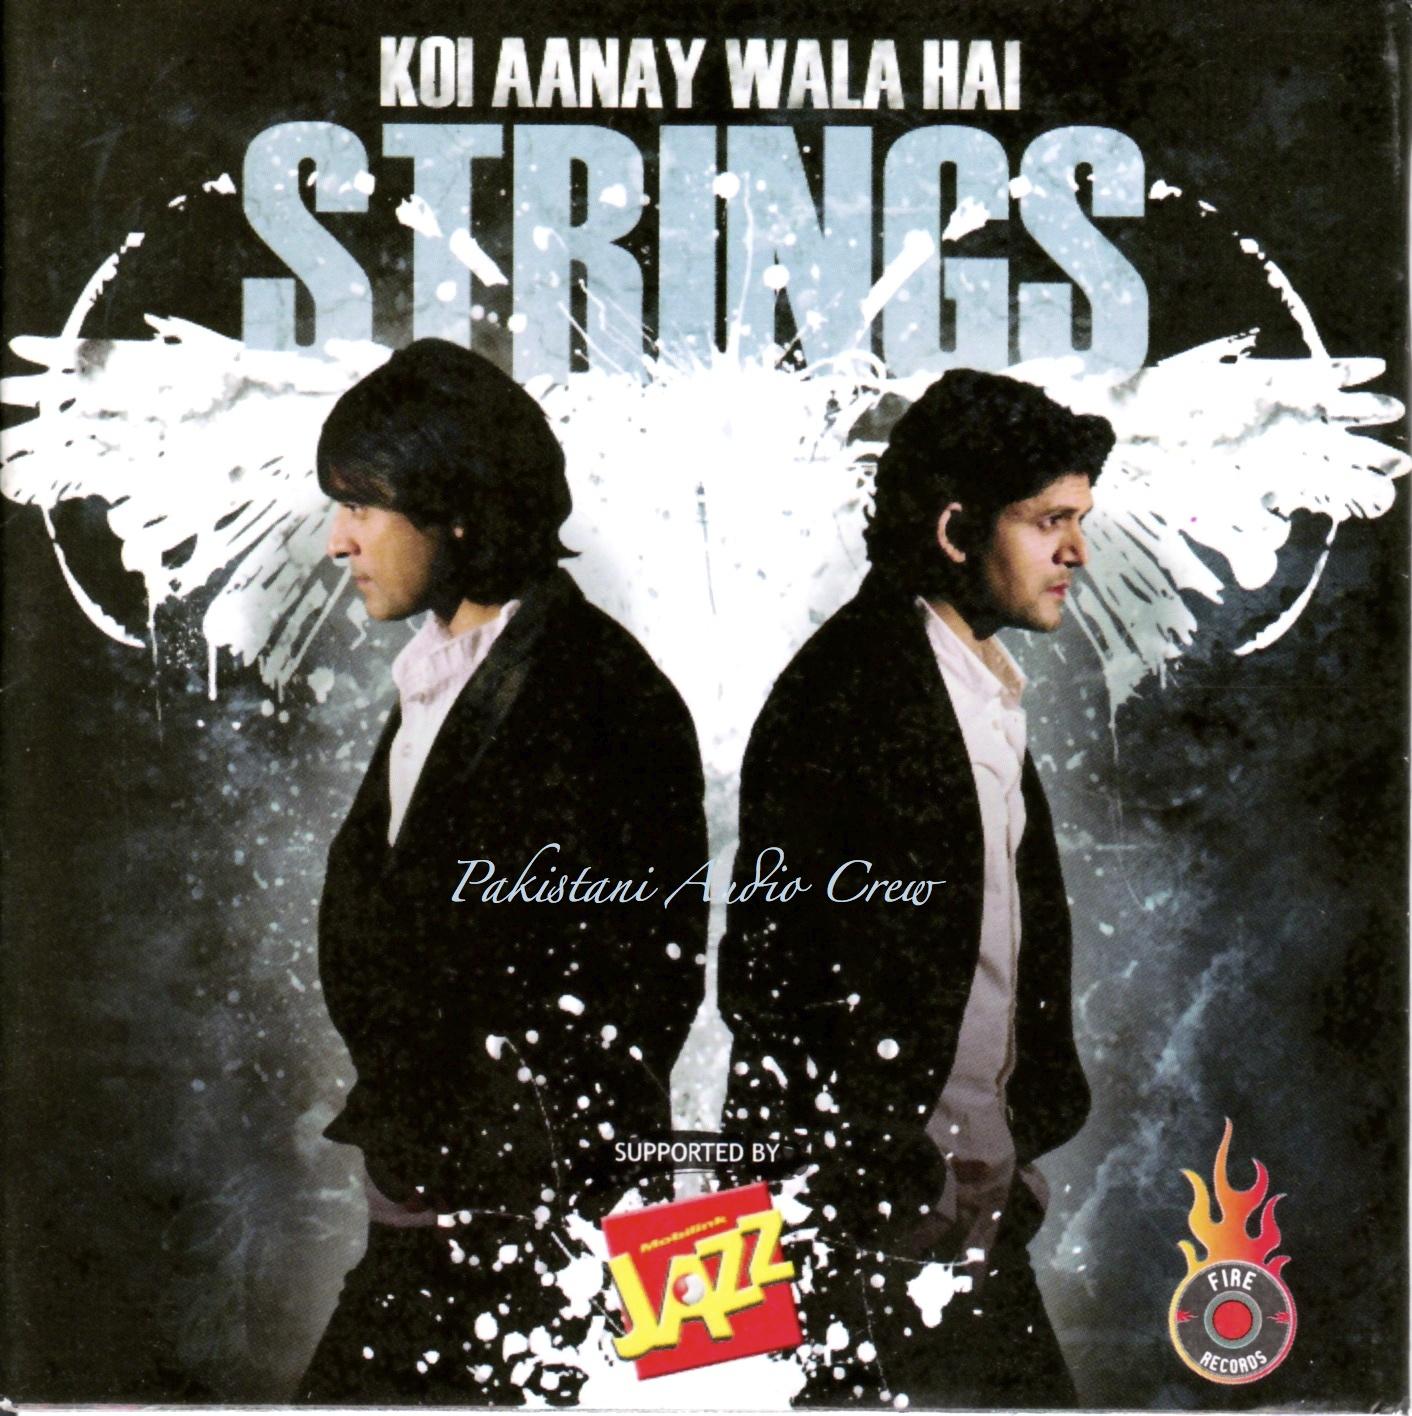 Koi Puchamera Dil Seee Download: Muzikeye: Strings [1990 To 2008-MP3-VBR-320Kbps]